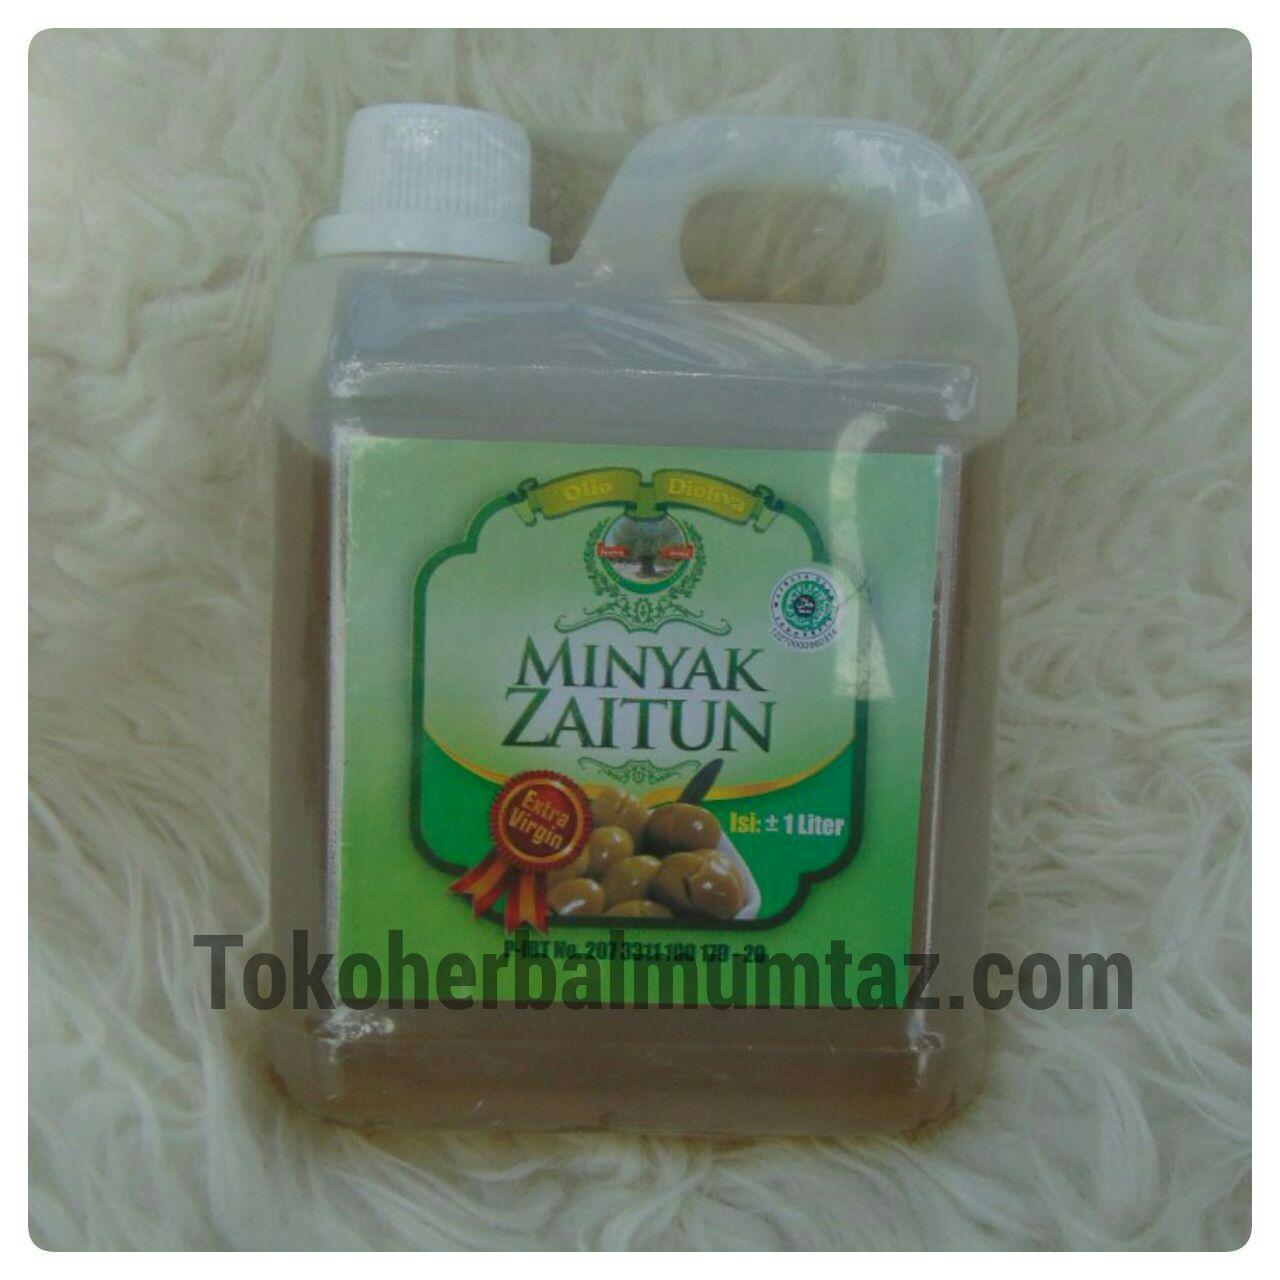 Minyak Zaitun Virgin Oil 1 Liter Toko Herbal Semarang Mumtaz 1liter